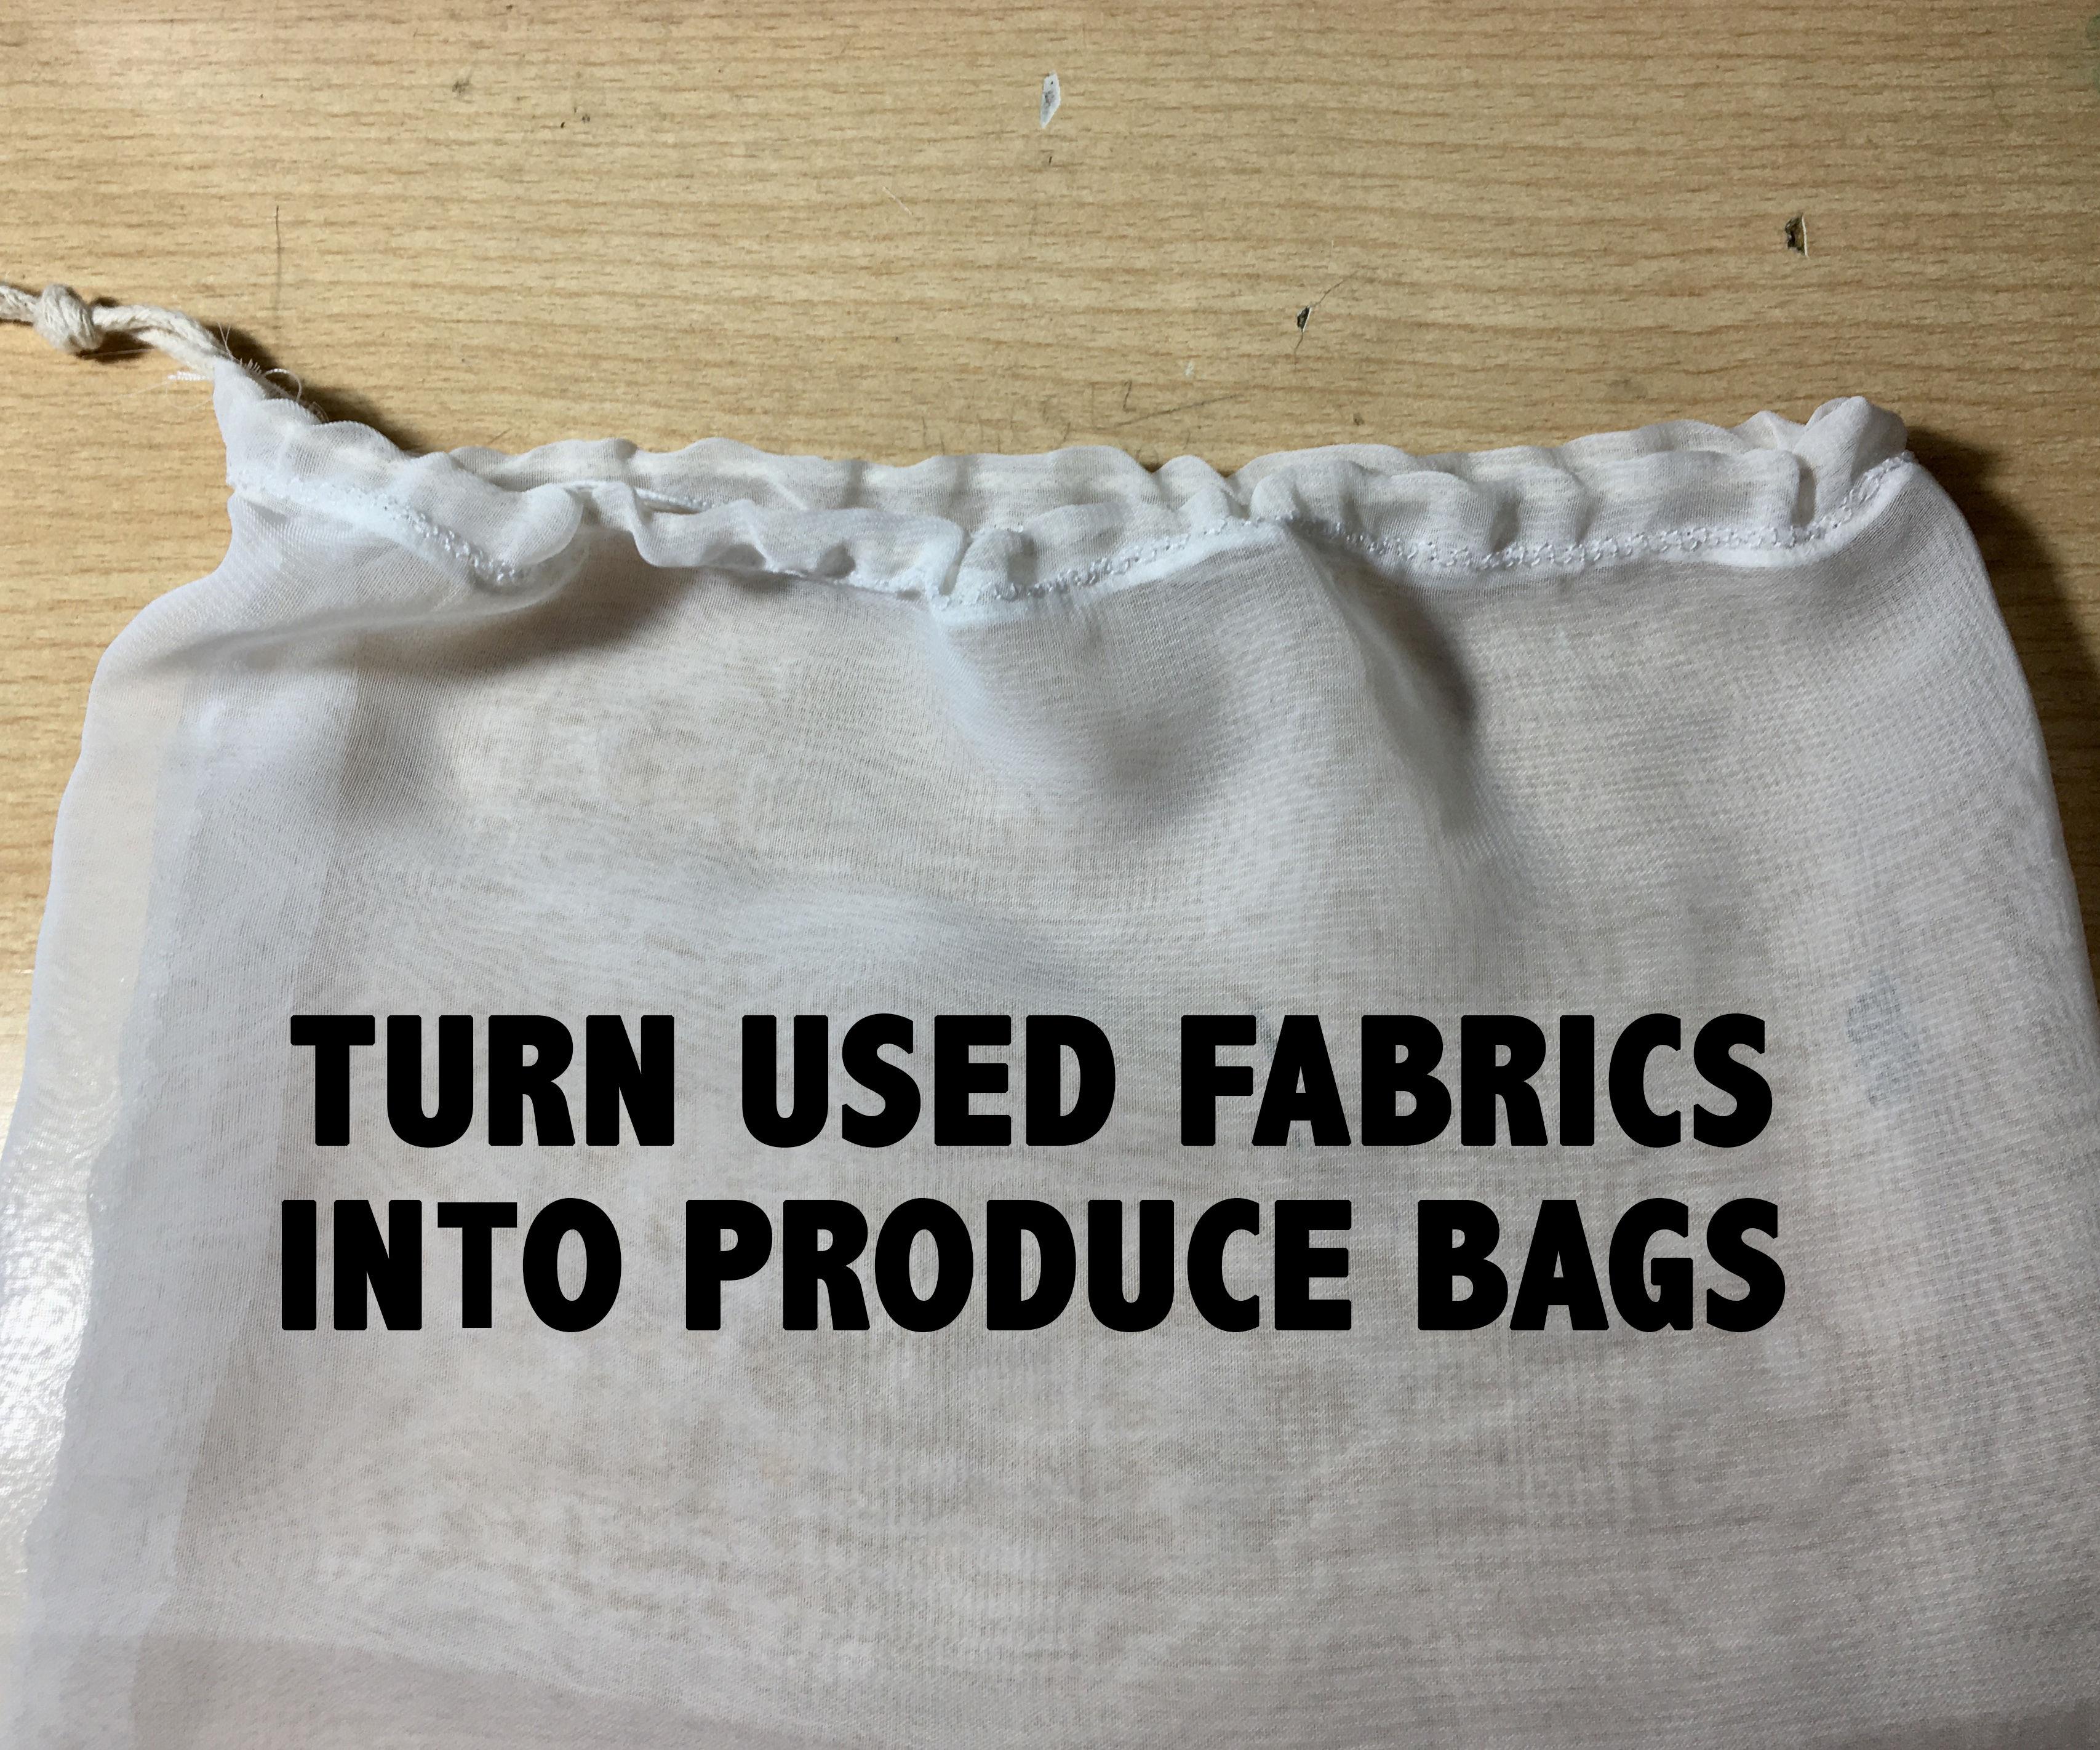 TURN USED FABRICS INTO PRODUCE BAGS